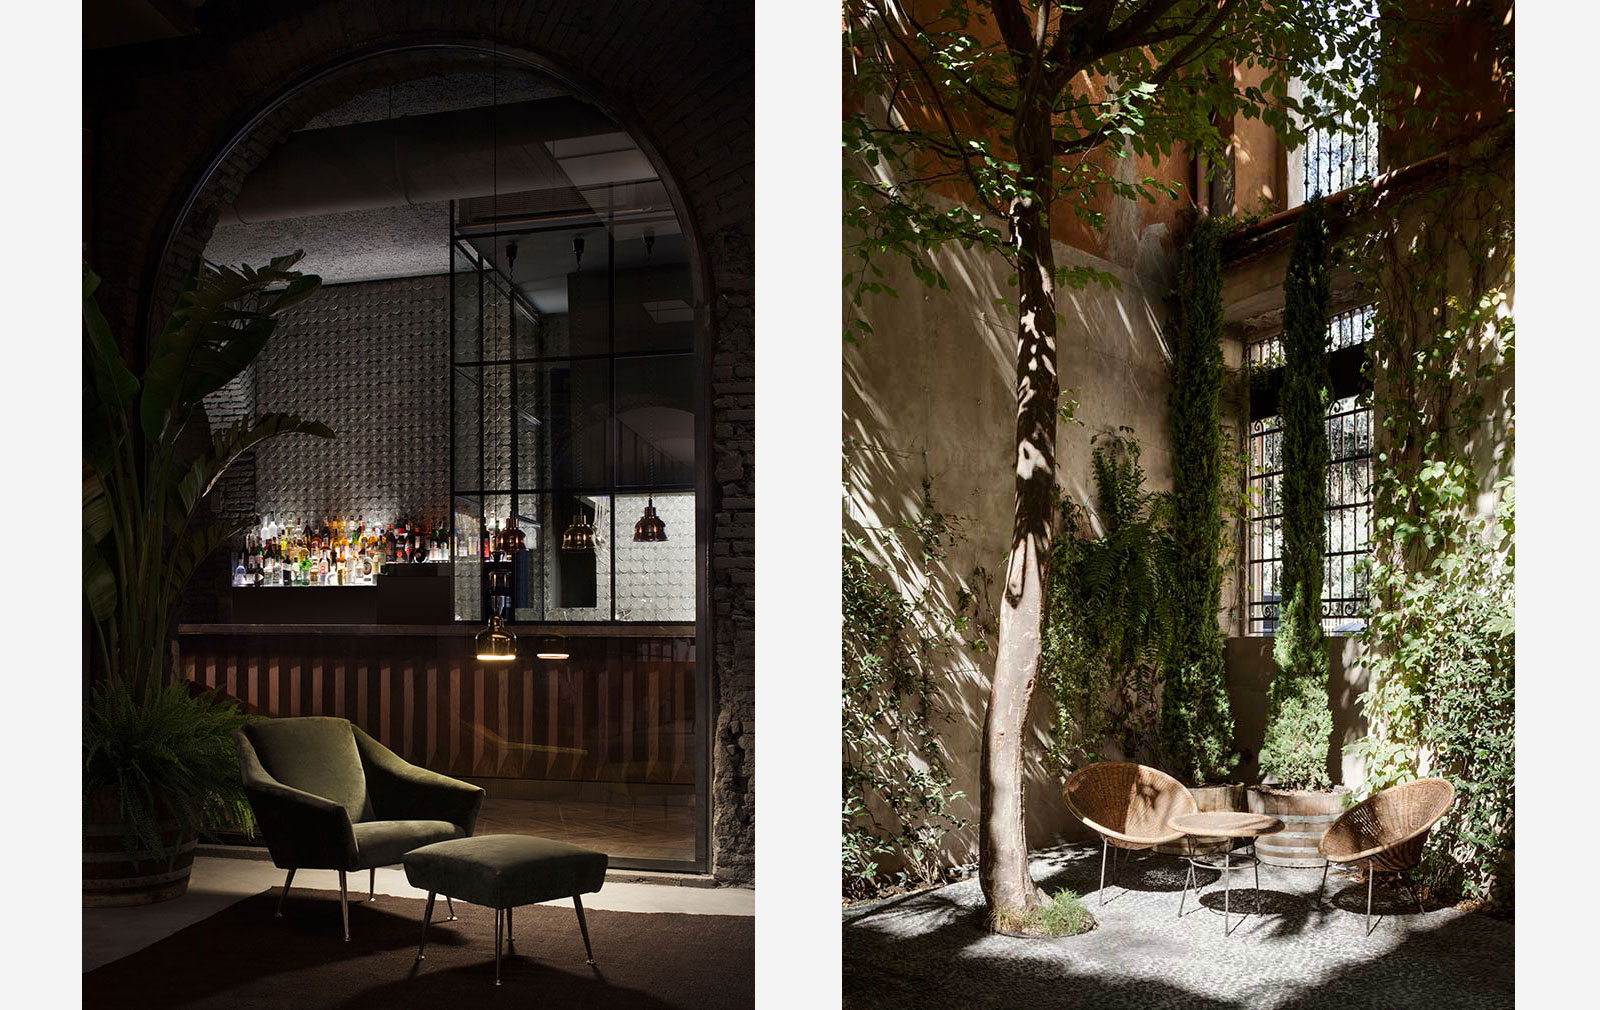 Six design gallery, Milan